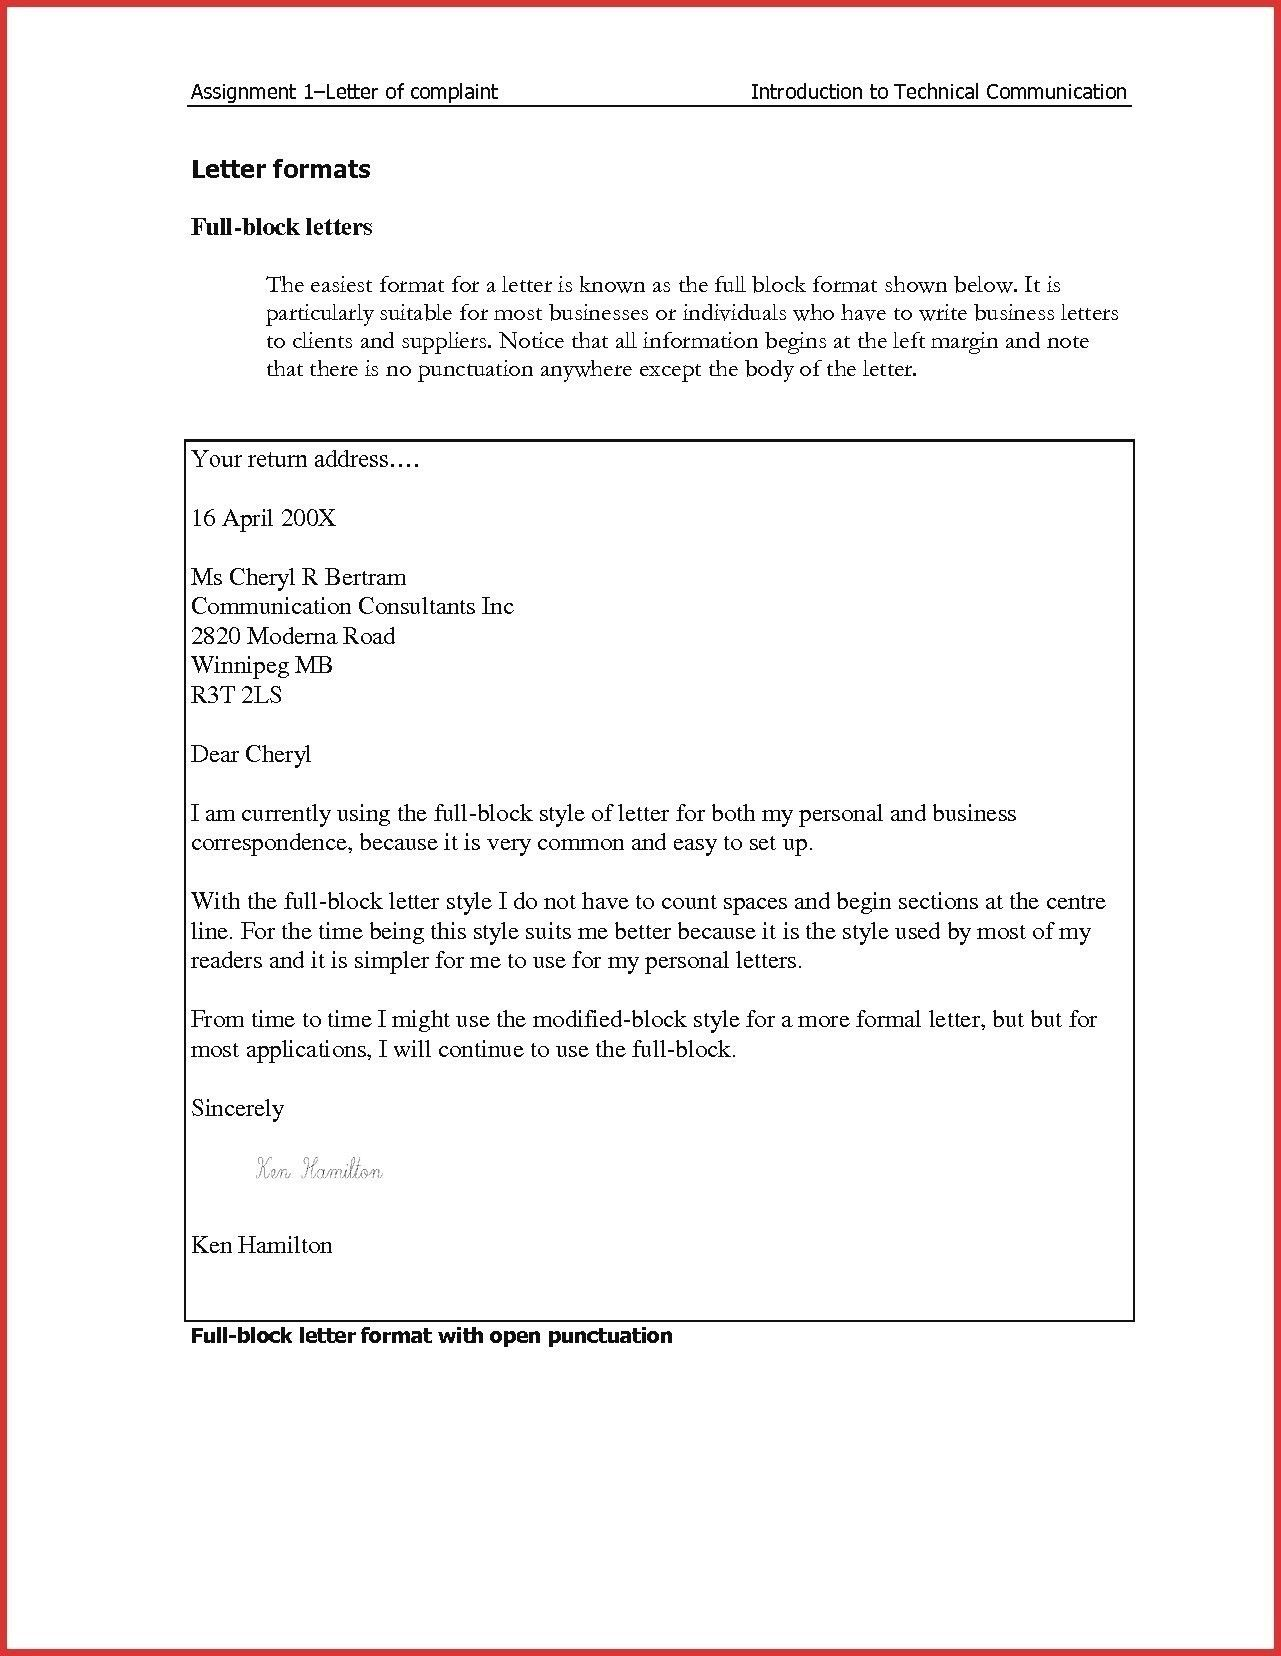 formal business letter uk block format full sample bank customer service representative resume objective skills from waitressing for a doctor